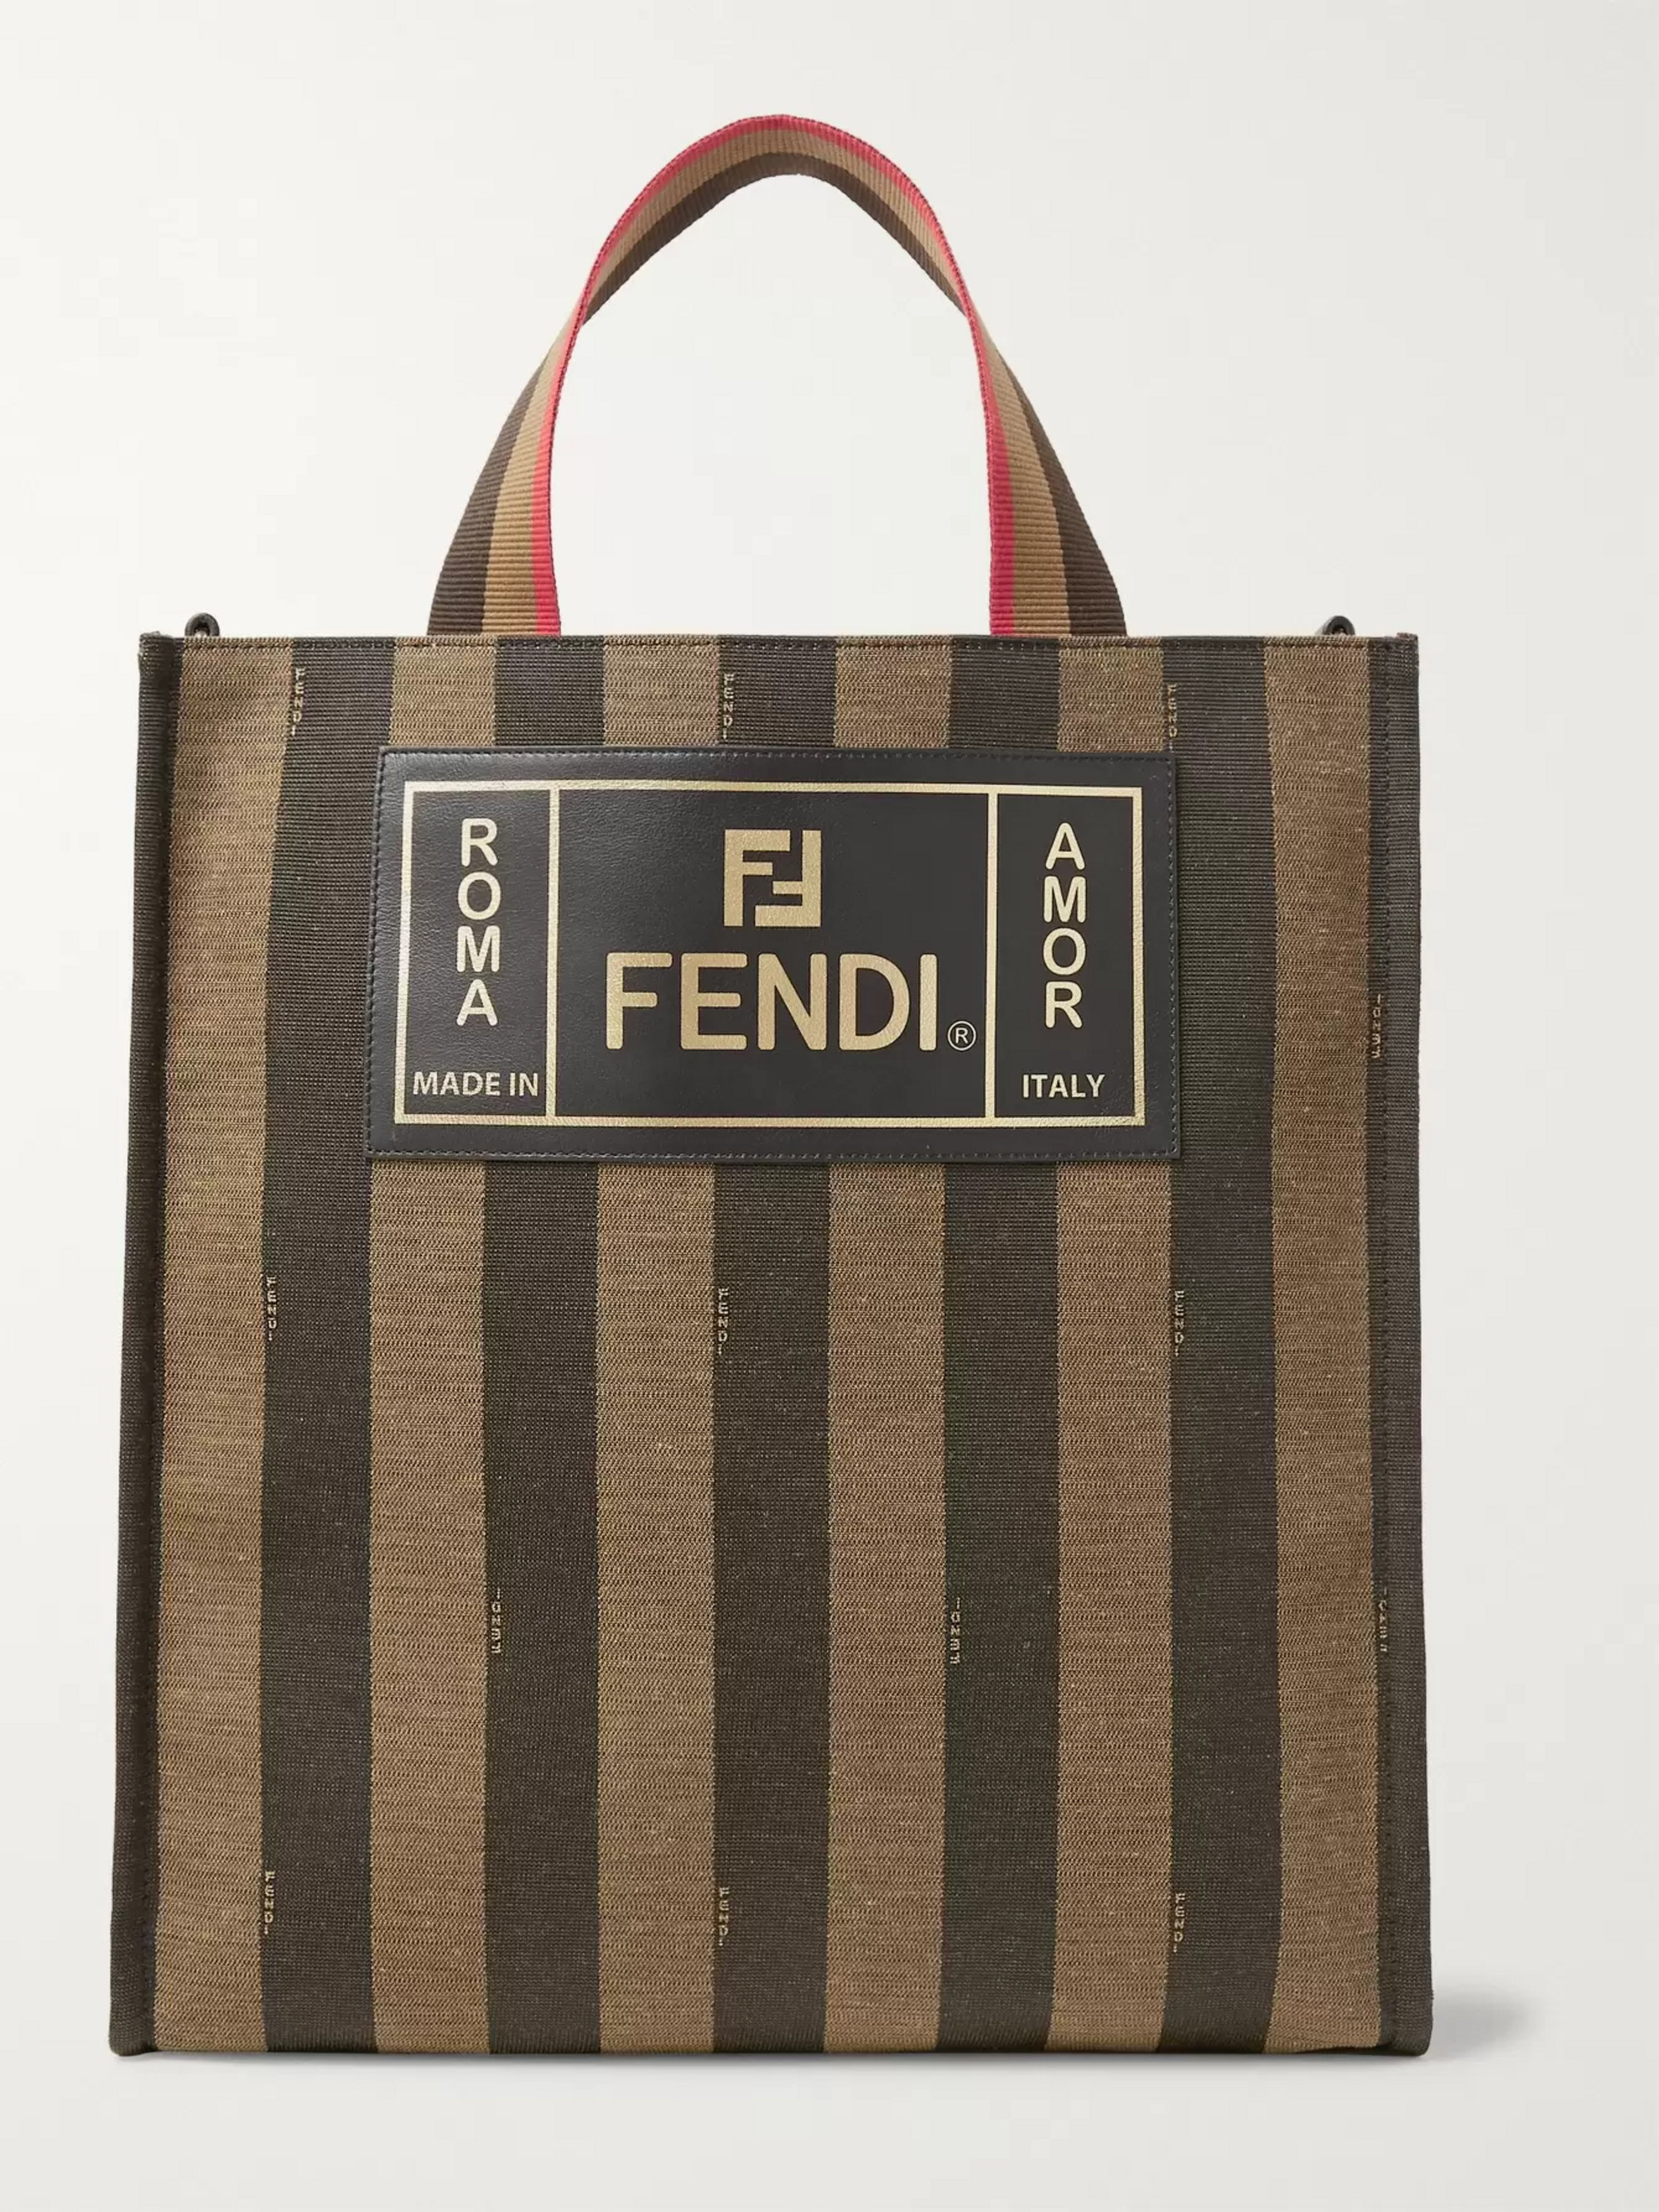 13ae2668495ef Brown Leather-Trimmed Striped Canvas Tote Bag   Fendi   MR PORTER